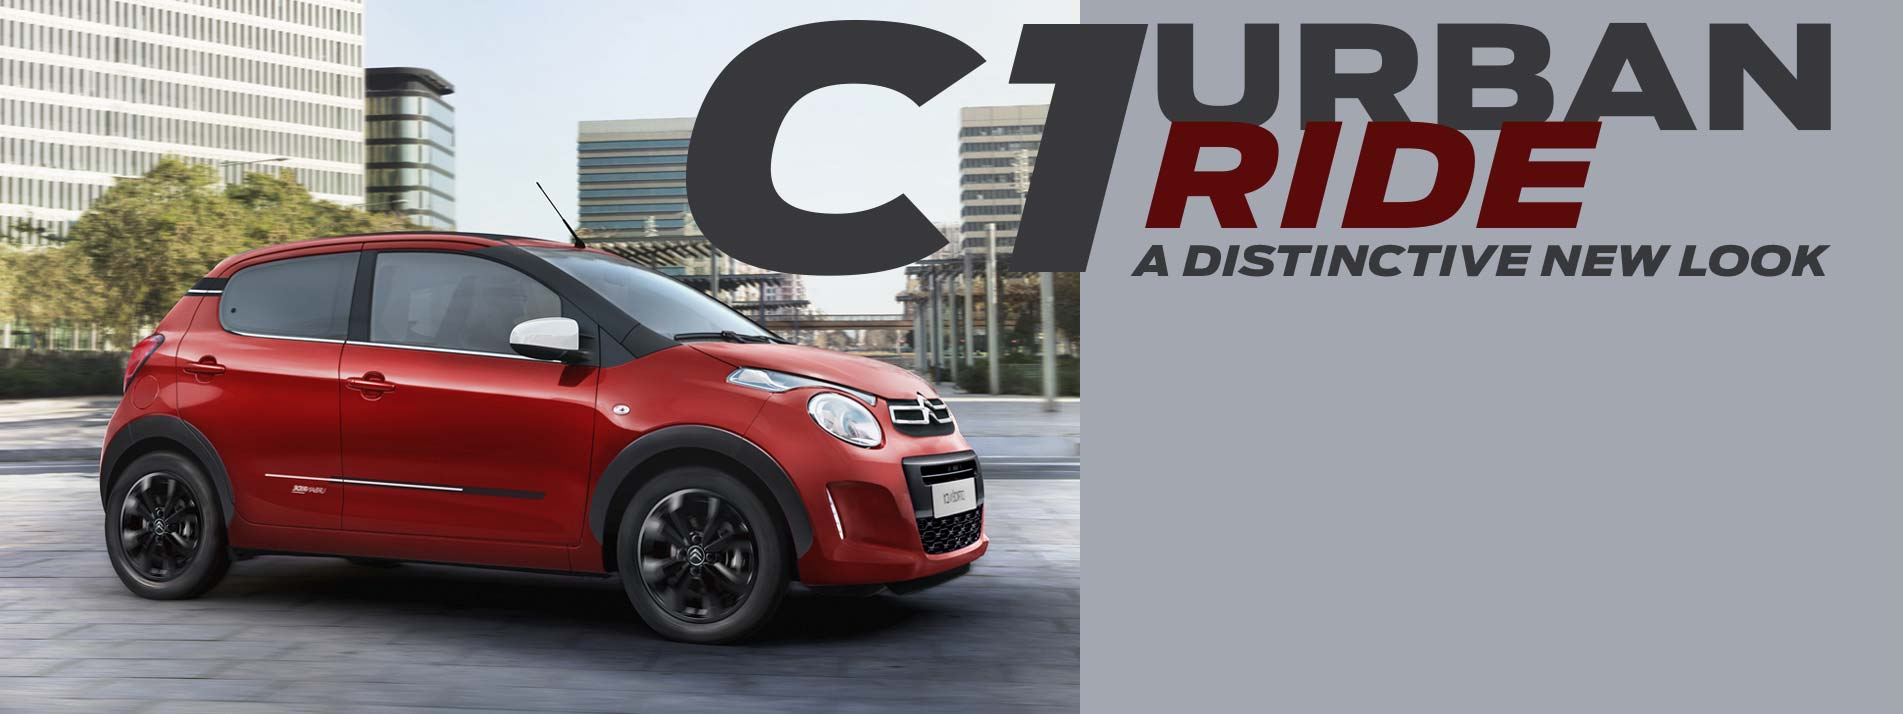 scarlet-red-citroen-c1-urban-ride-now-available-at-aldershot-m-sli